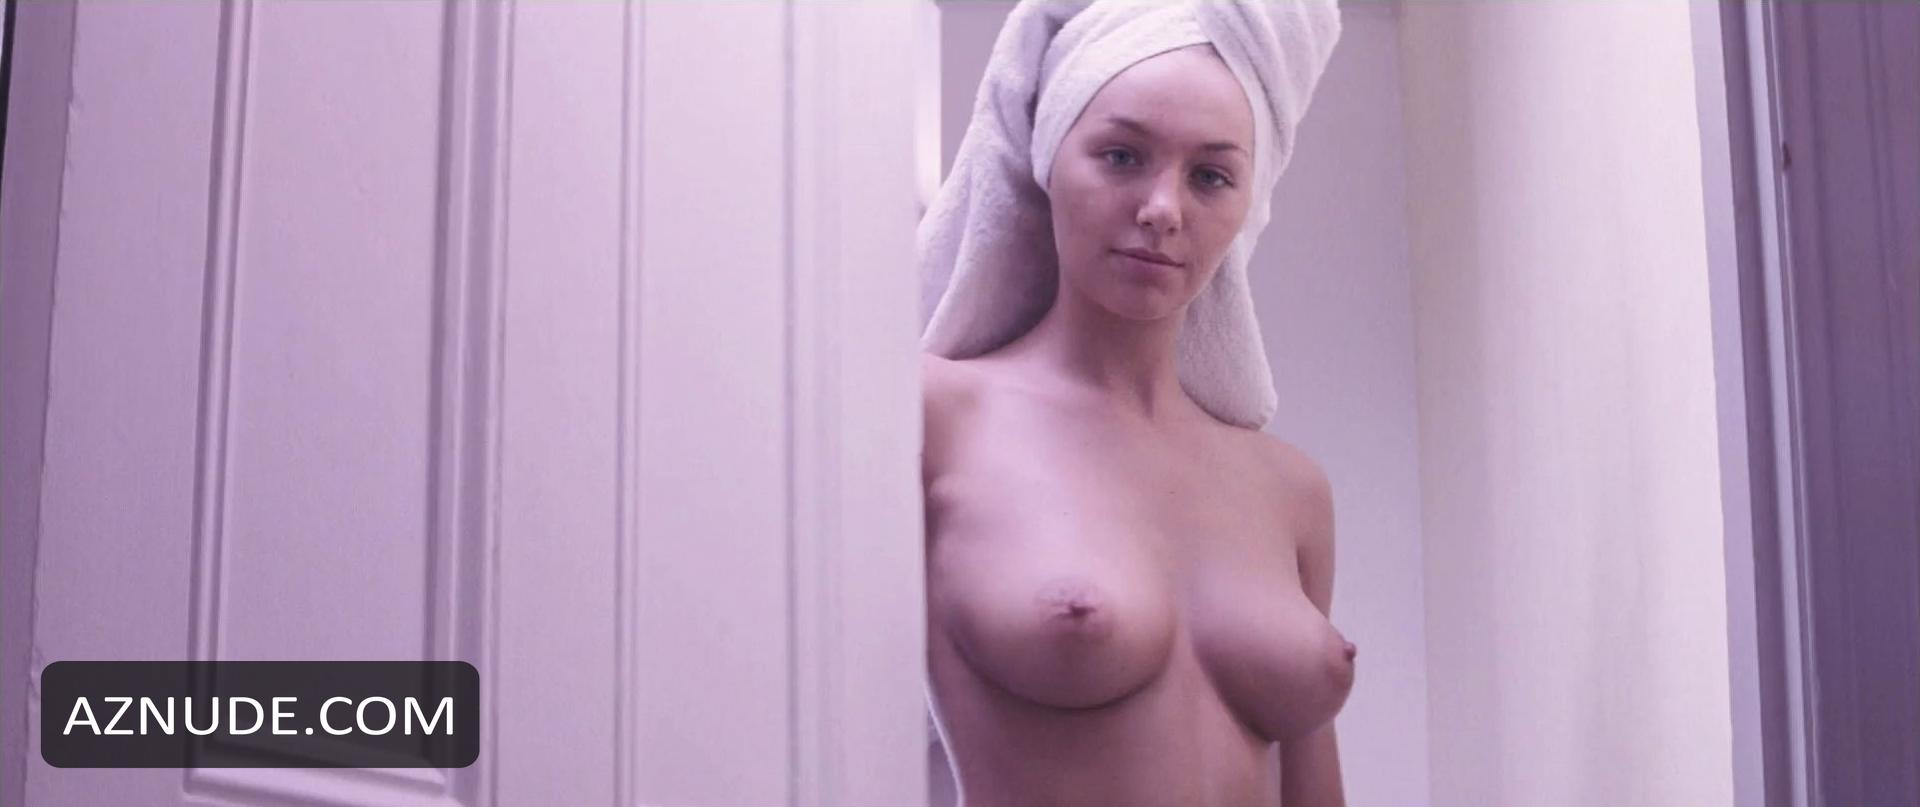 Teri recommend Hot women posing showing upskirt panties